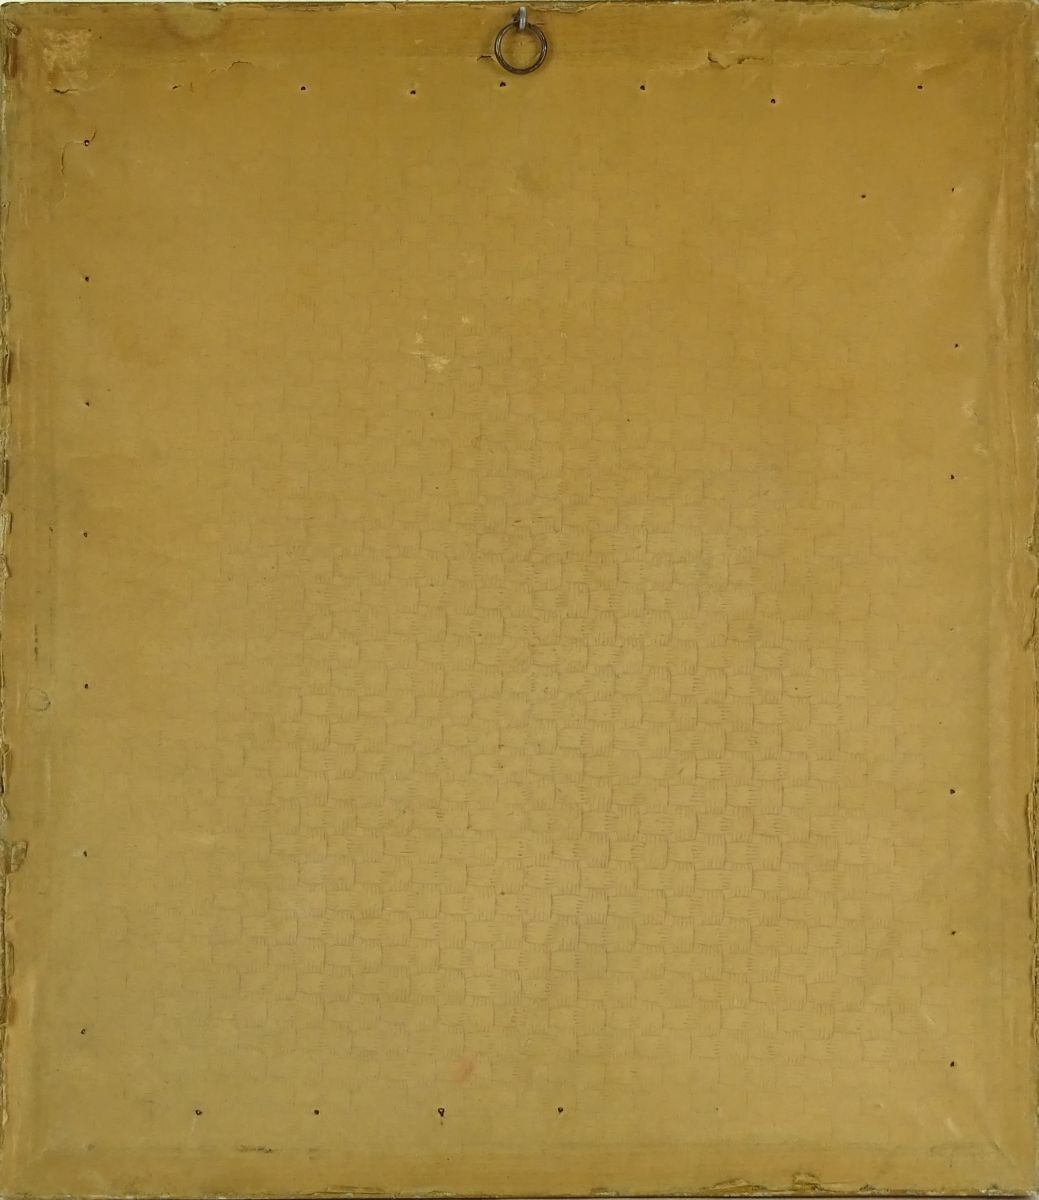 DSC09869.JPG (1039×1200)